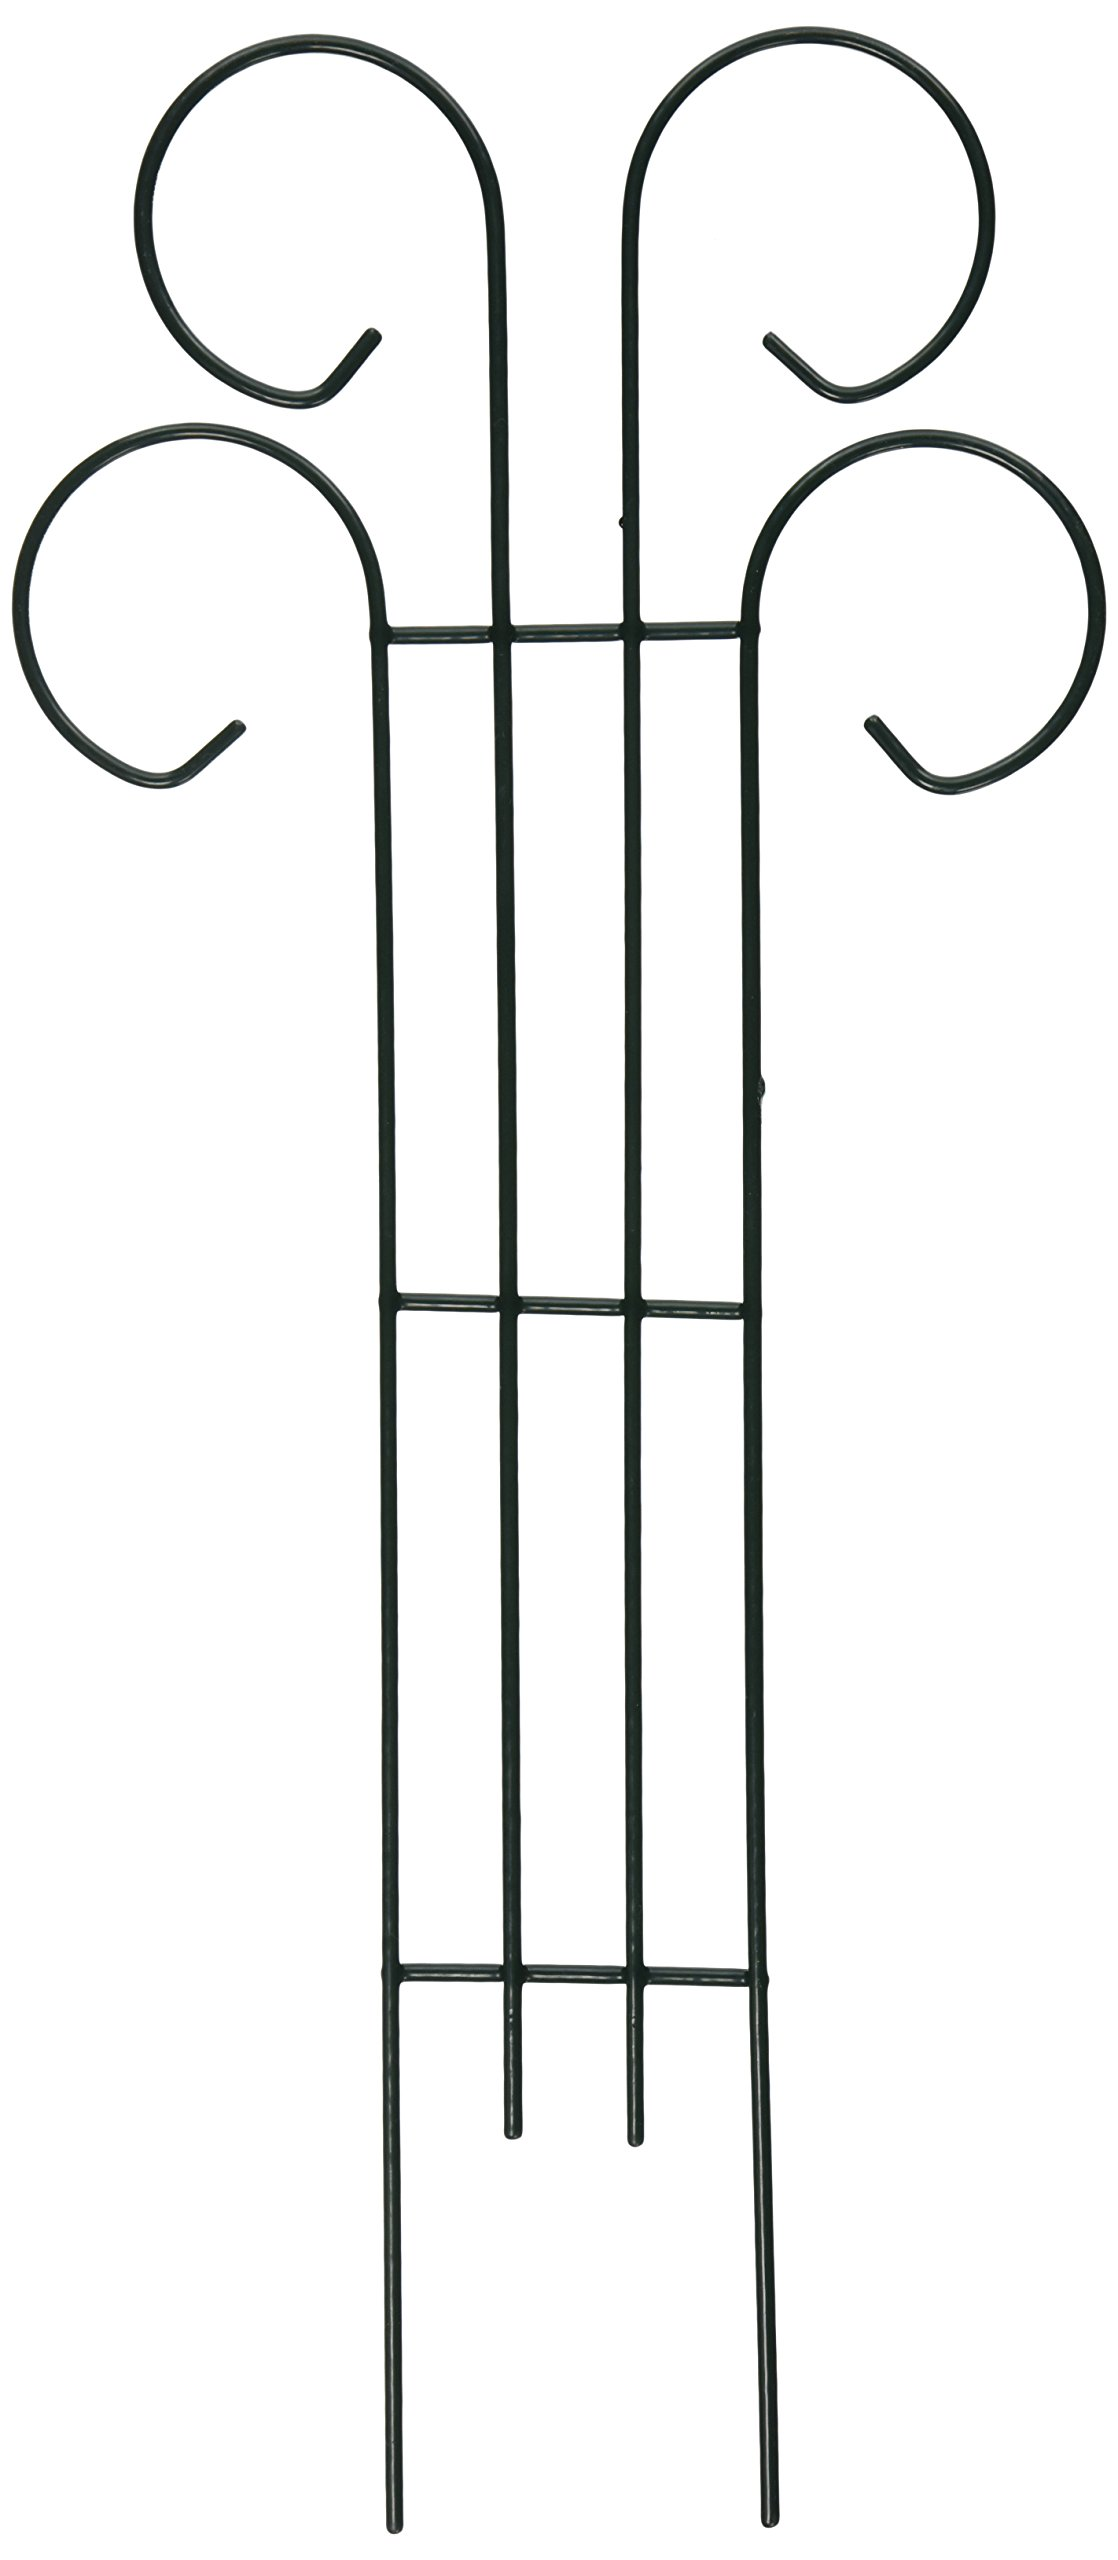 Bosmere L510 Metal Scroll Design Trellis, Green, 18-Inch